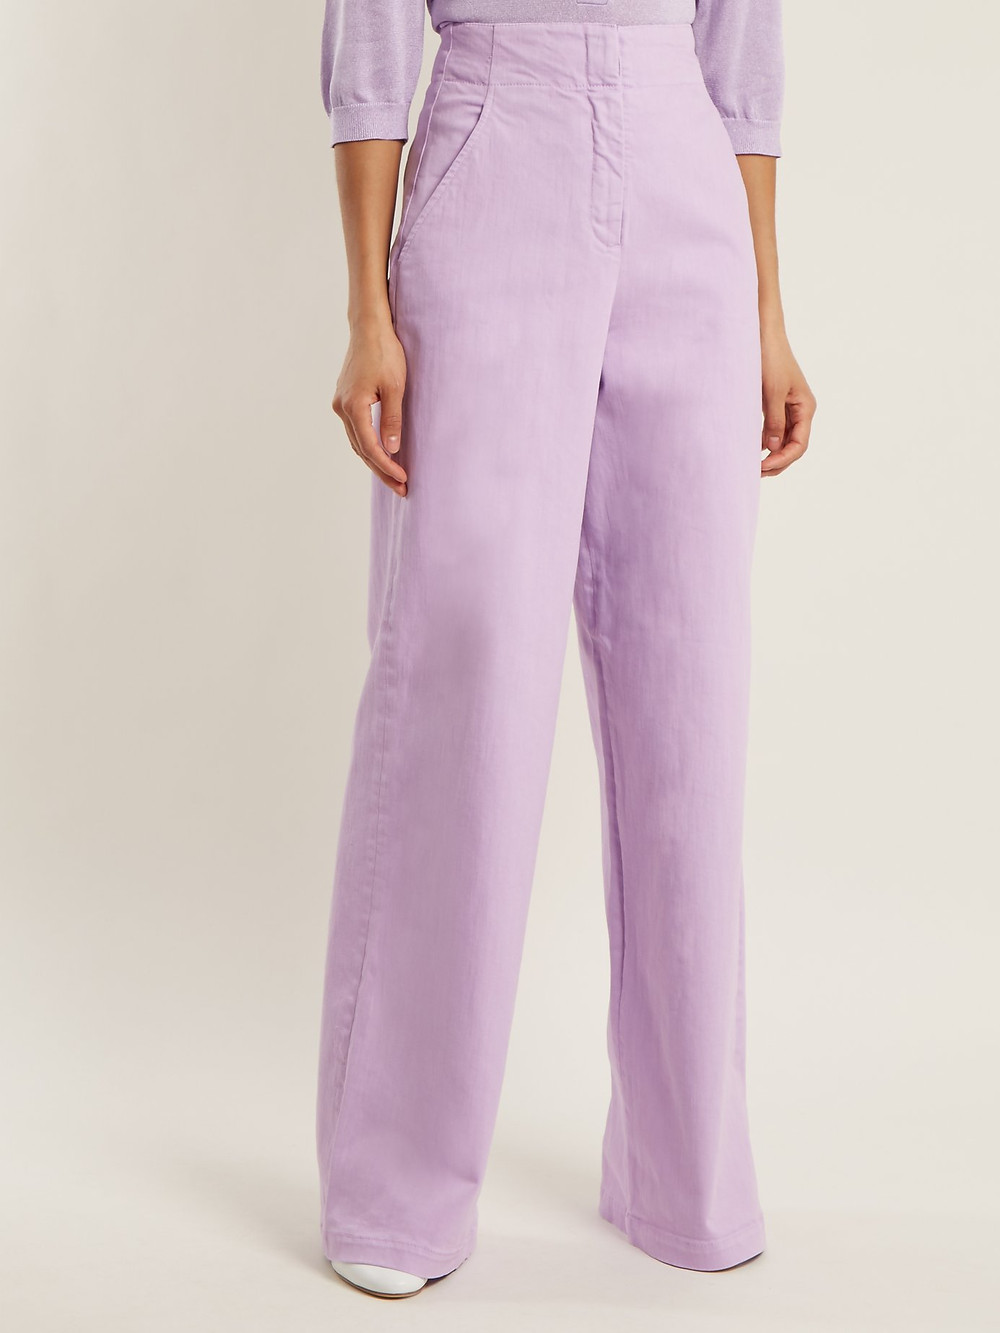 Tibi High-rise wide-leg jeans